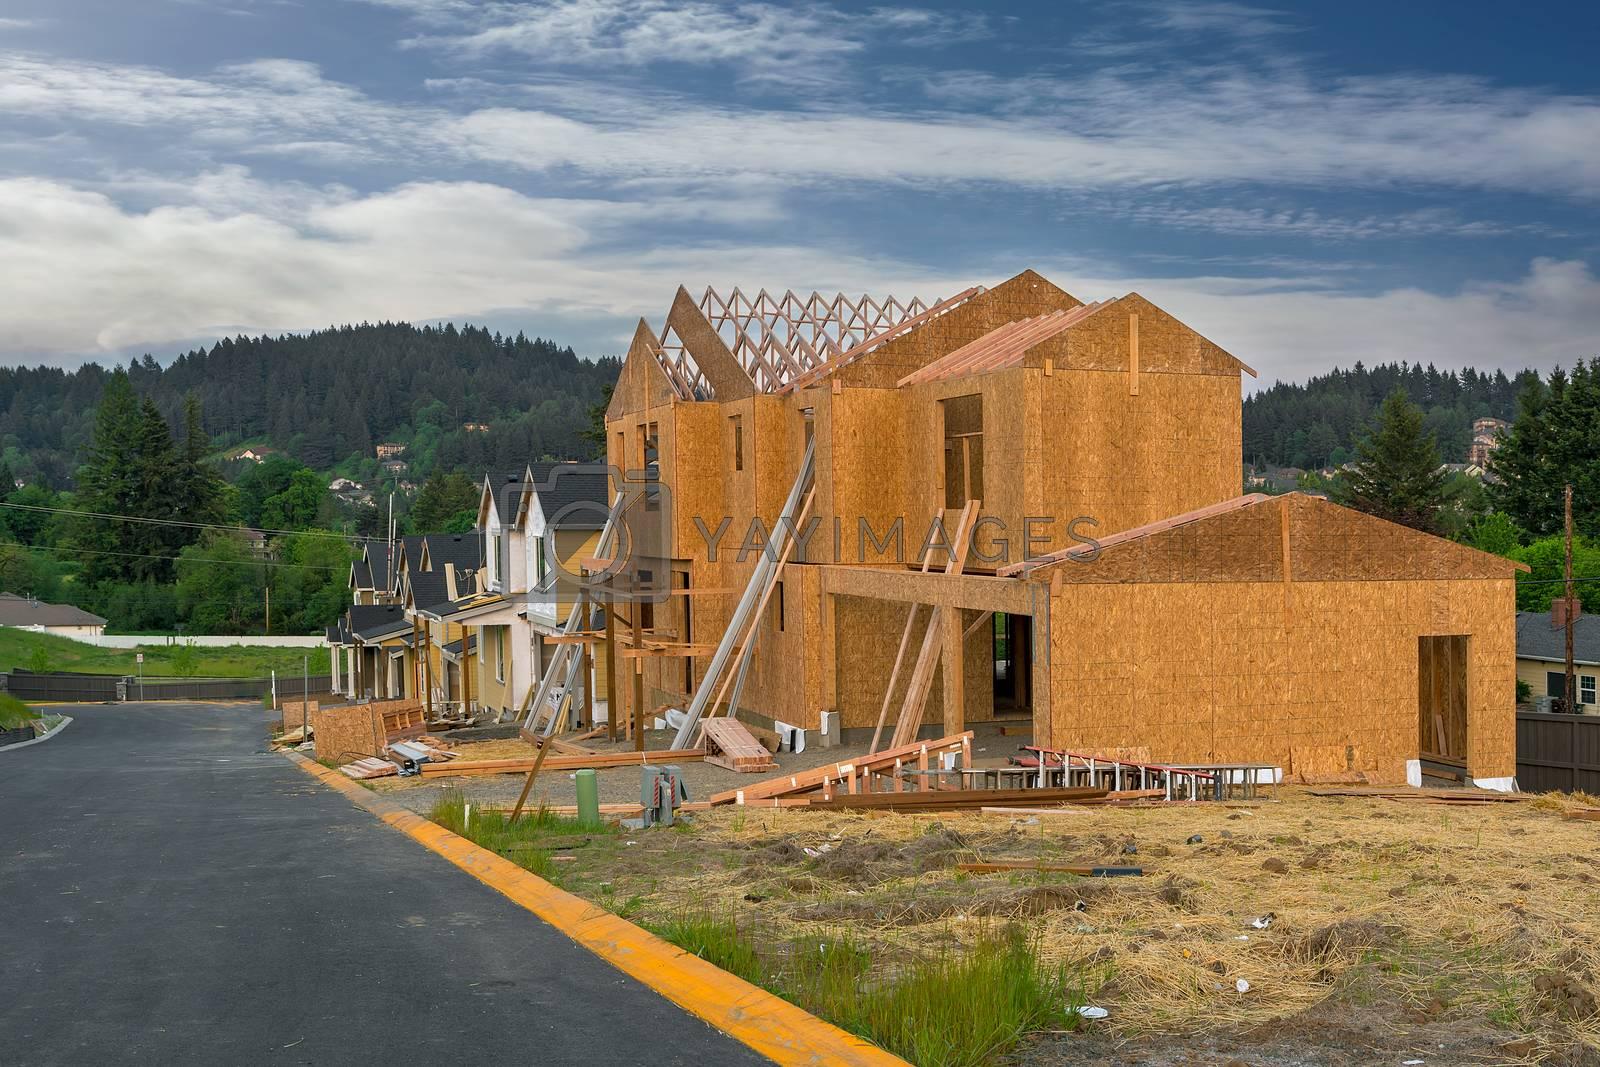 New home construction in Happy Valley Oregon North American suburban subdivision